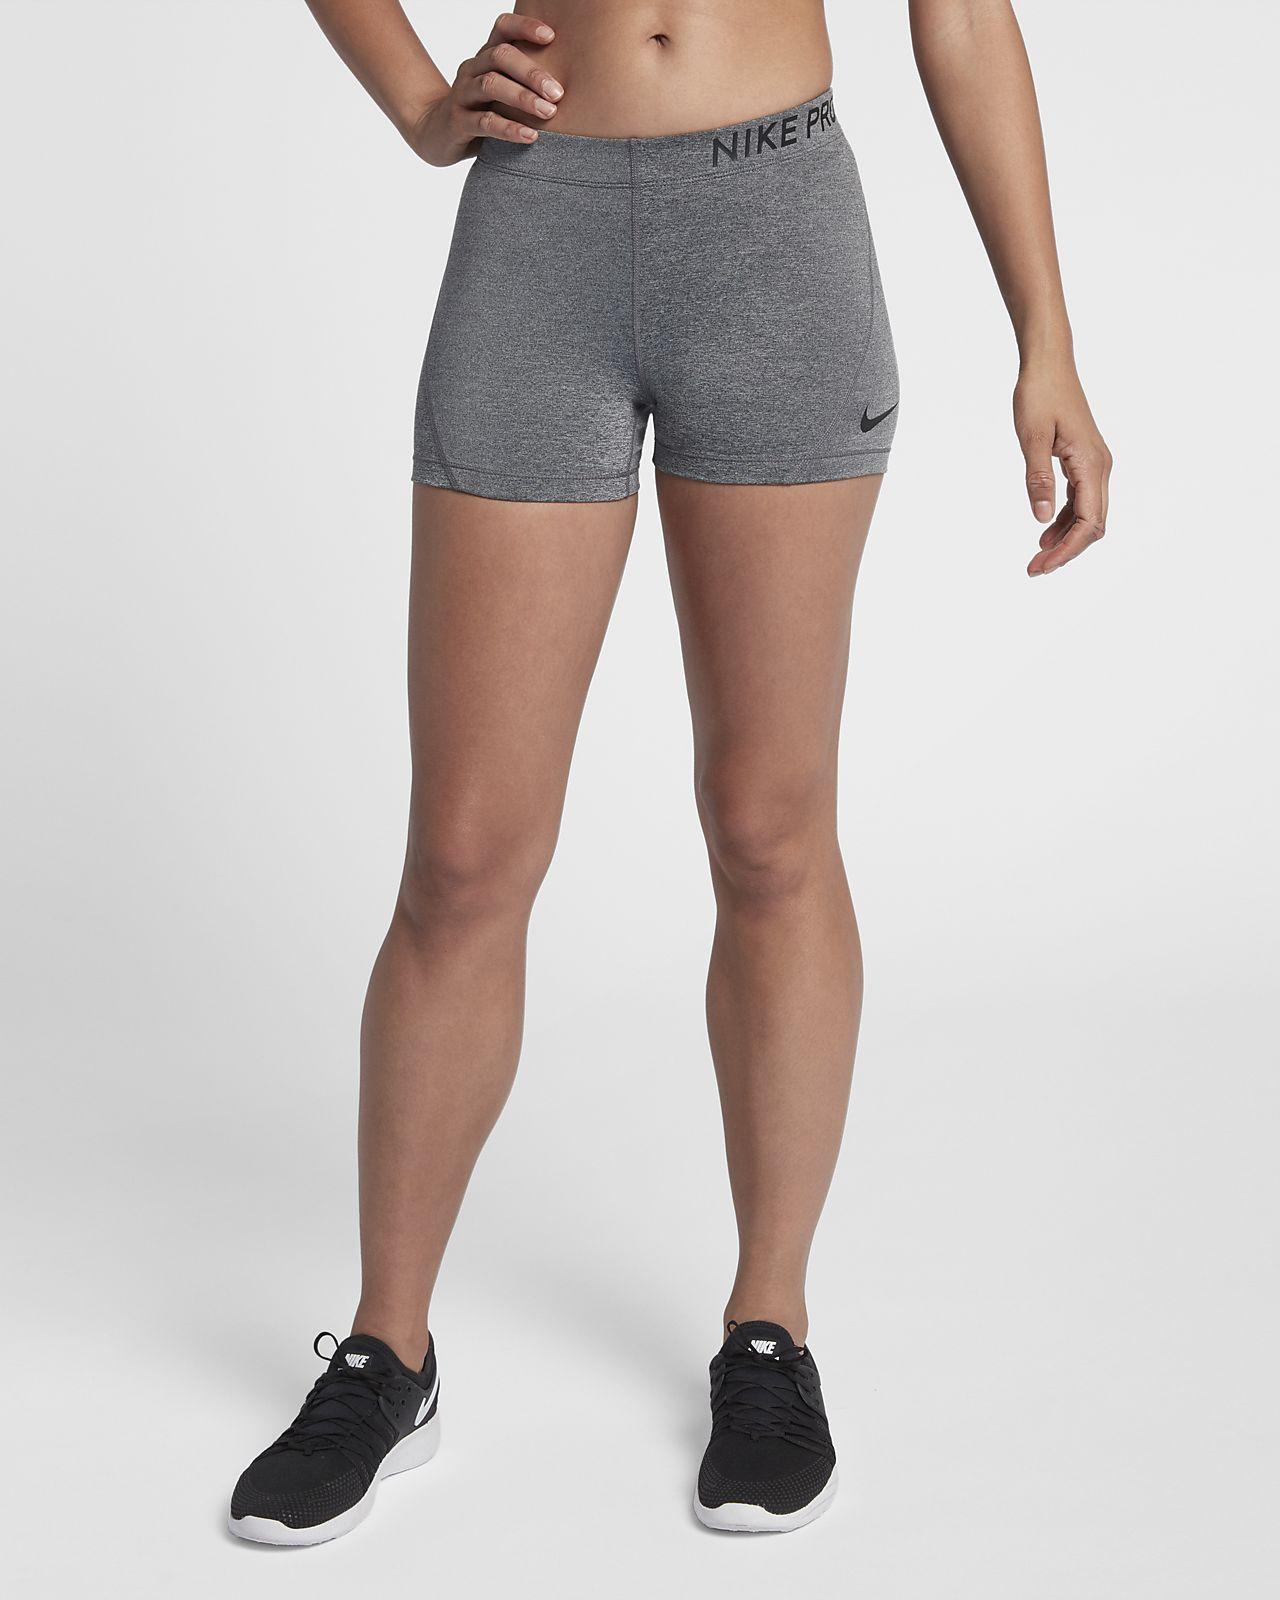 2989ecb57166 Nike Women s 3 Training Shorts Pro in 2019